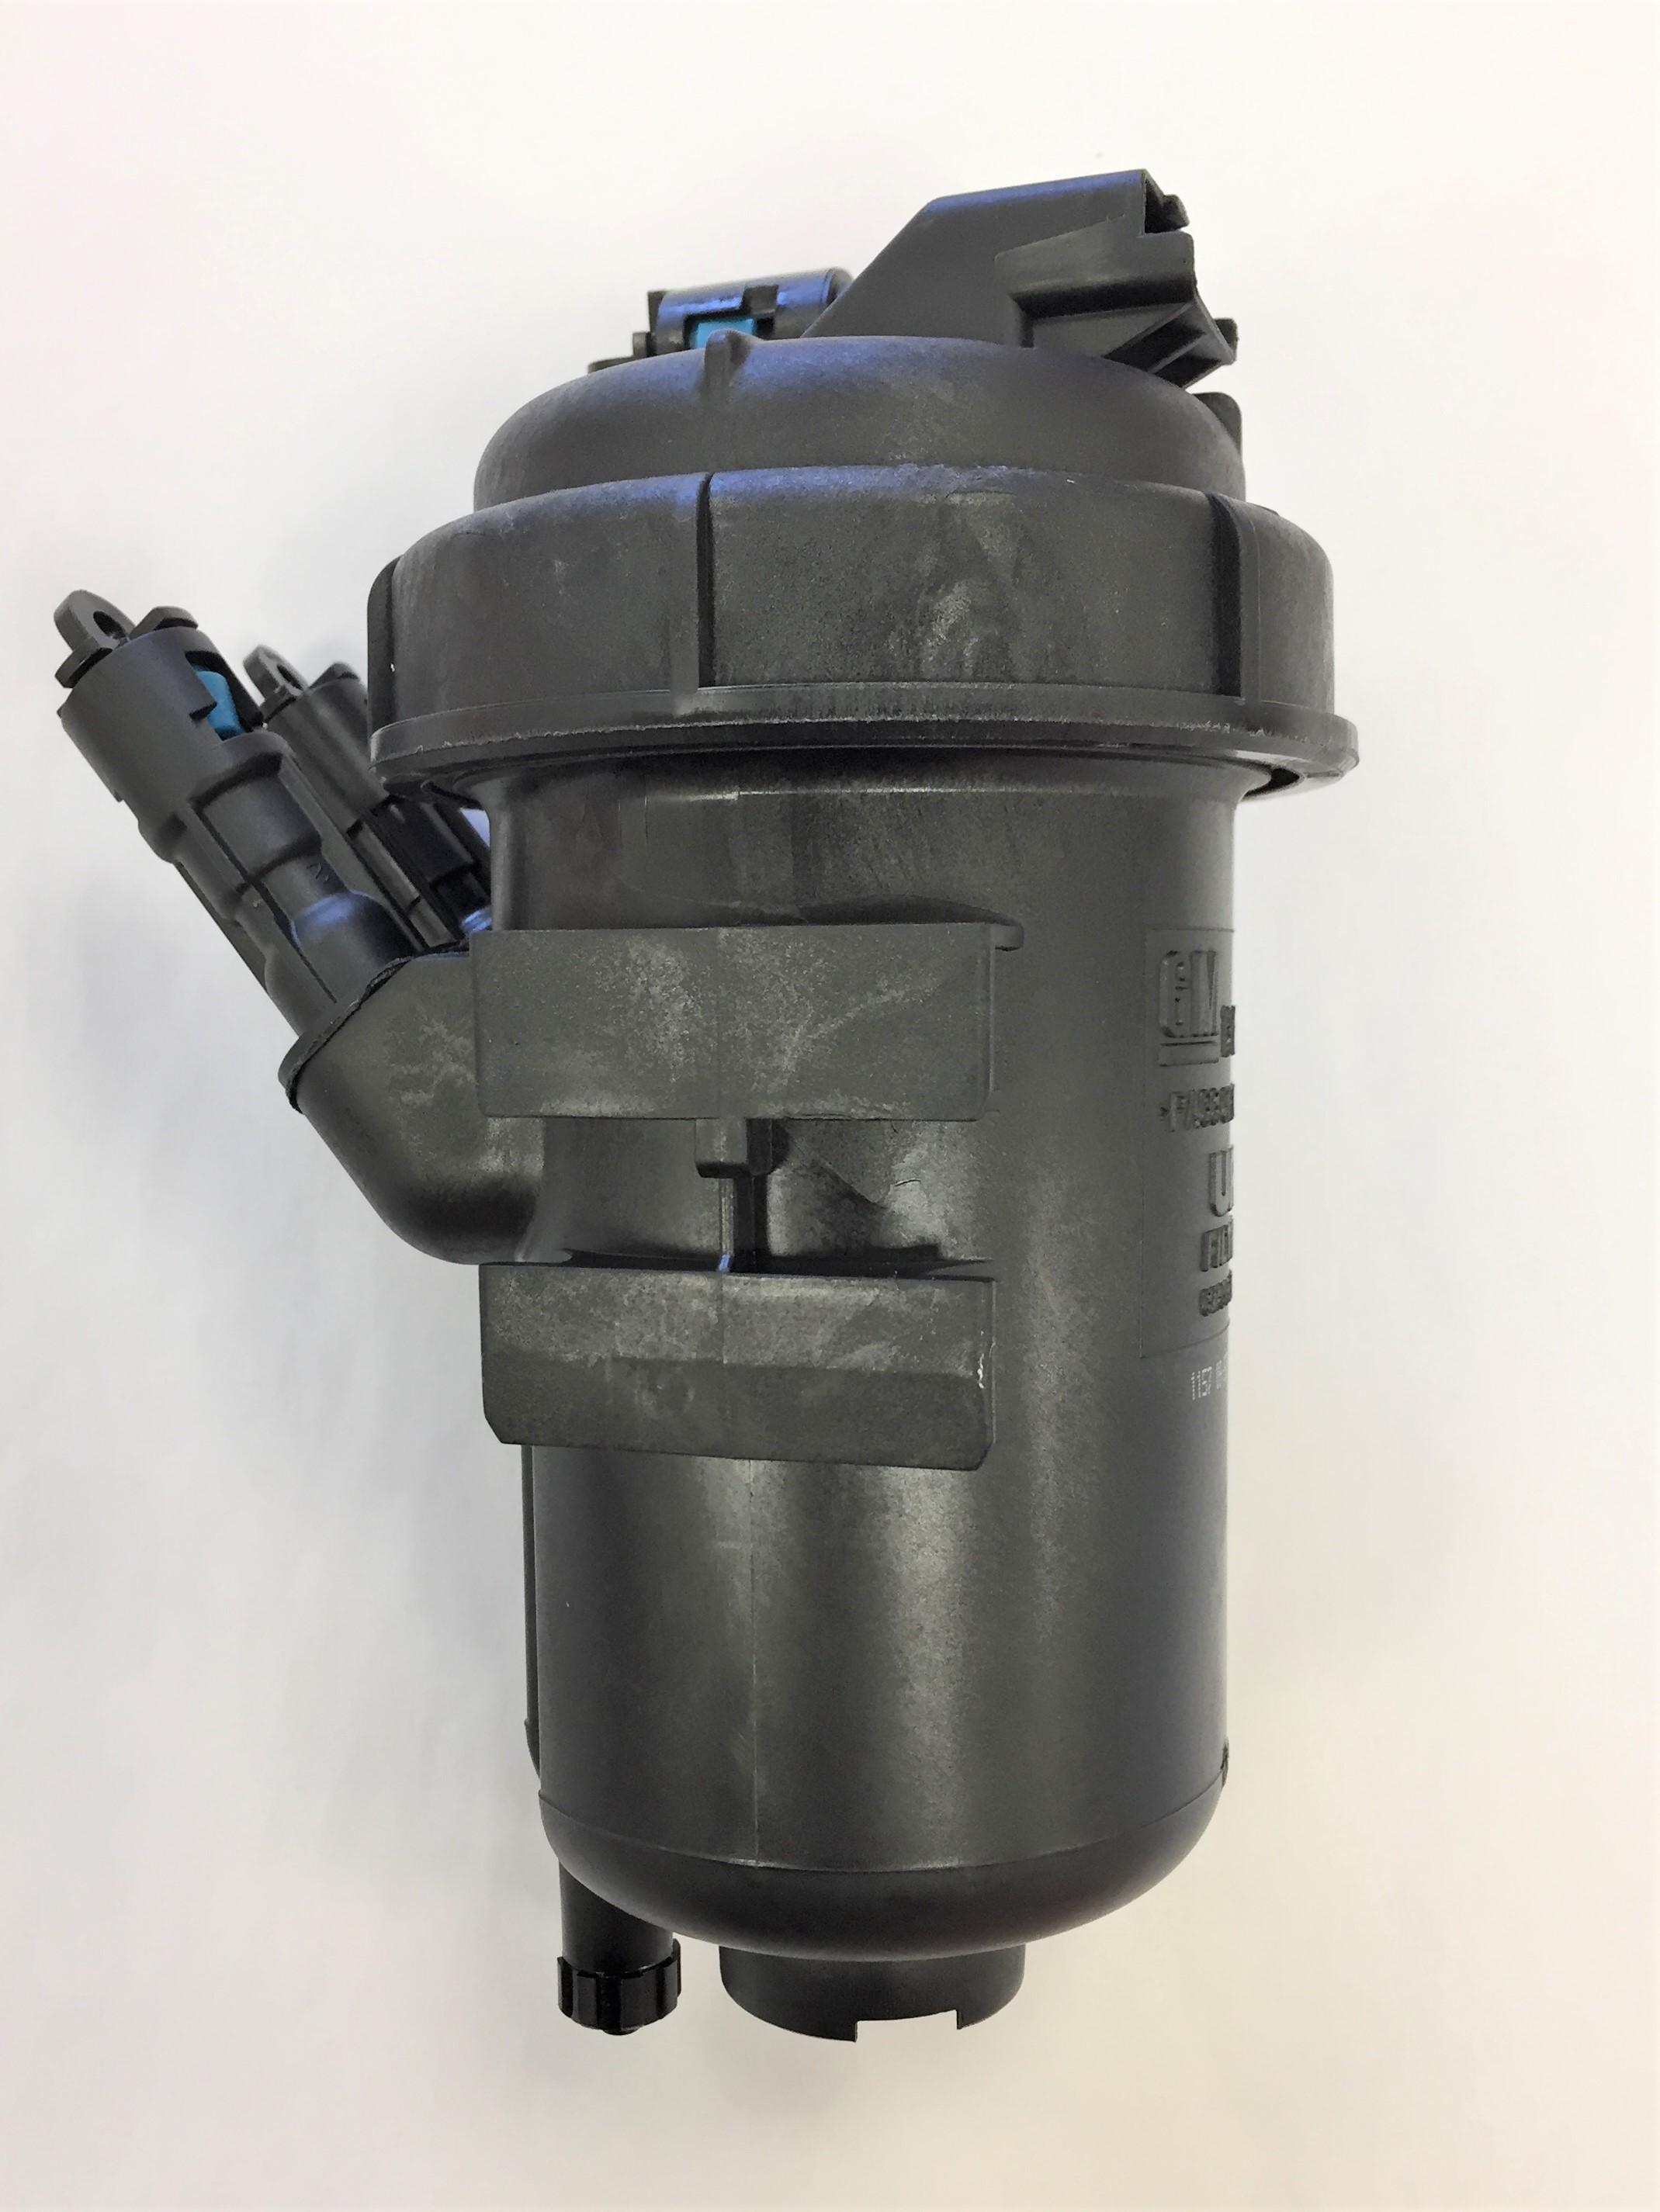 Genuine Vauxhall Corsa Vectra Signum Agila 1.3 1.9 Diesel Fuel Filter 95599700